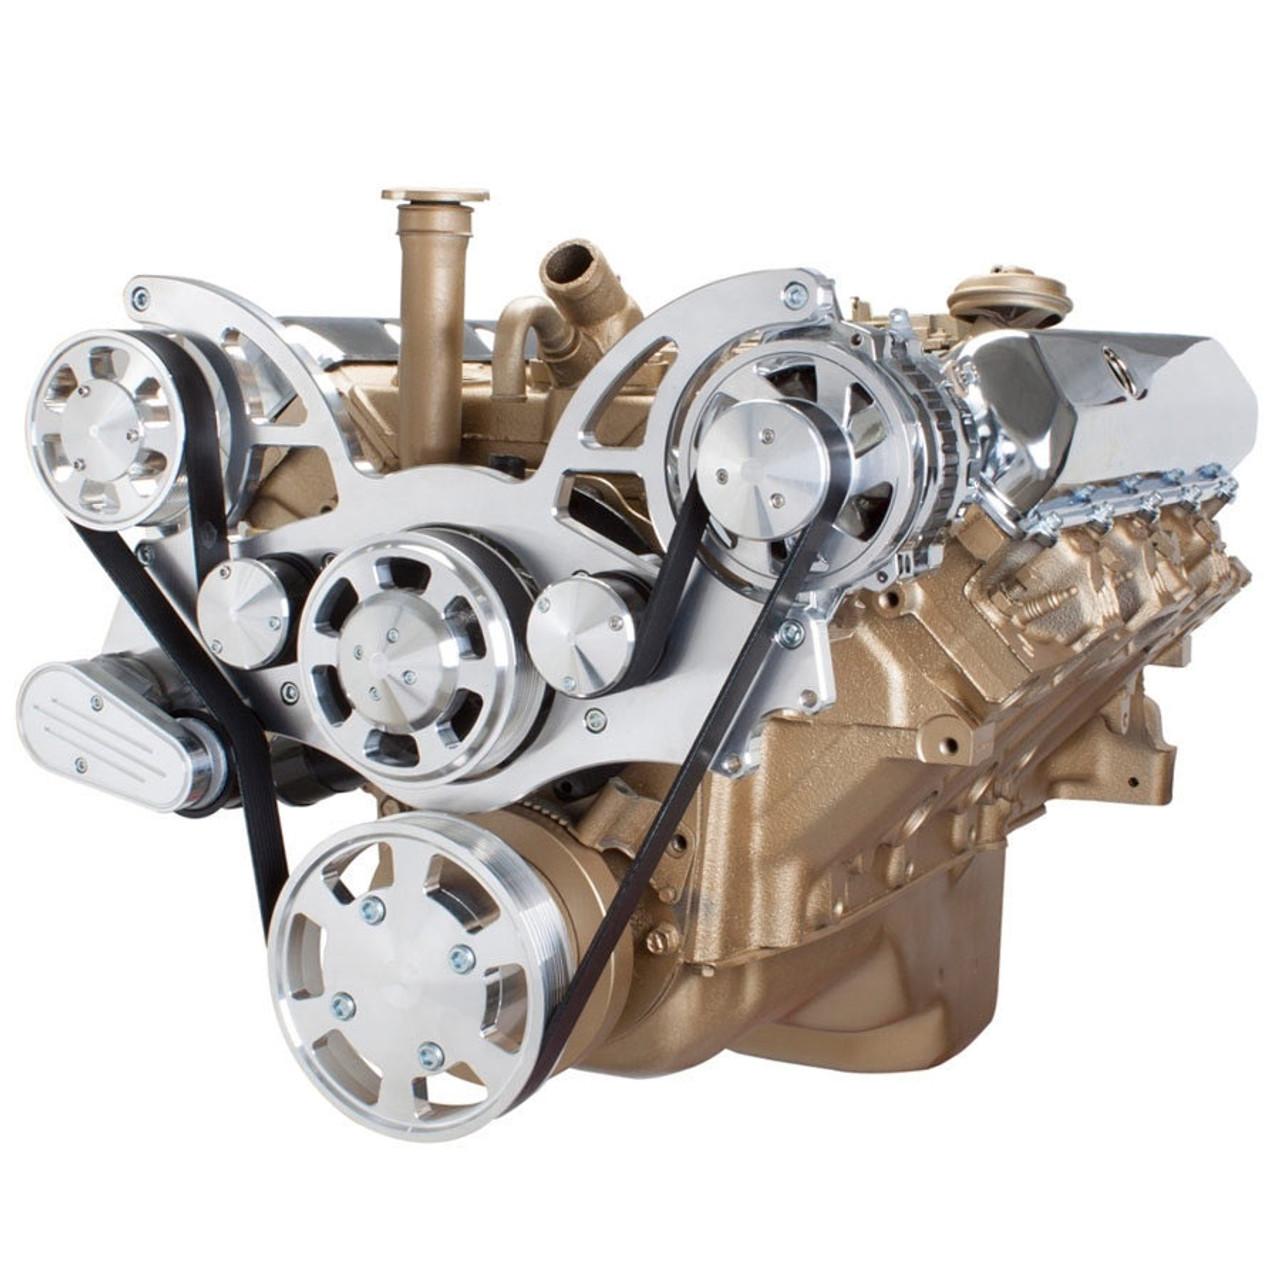 Serpentine System For Oldsmobile 350 455 Alternator Only All Inclusive Rocket Engine Diagram